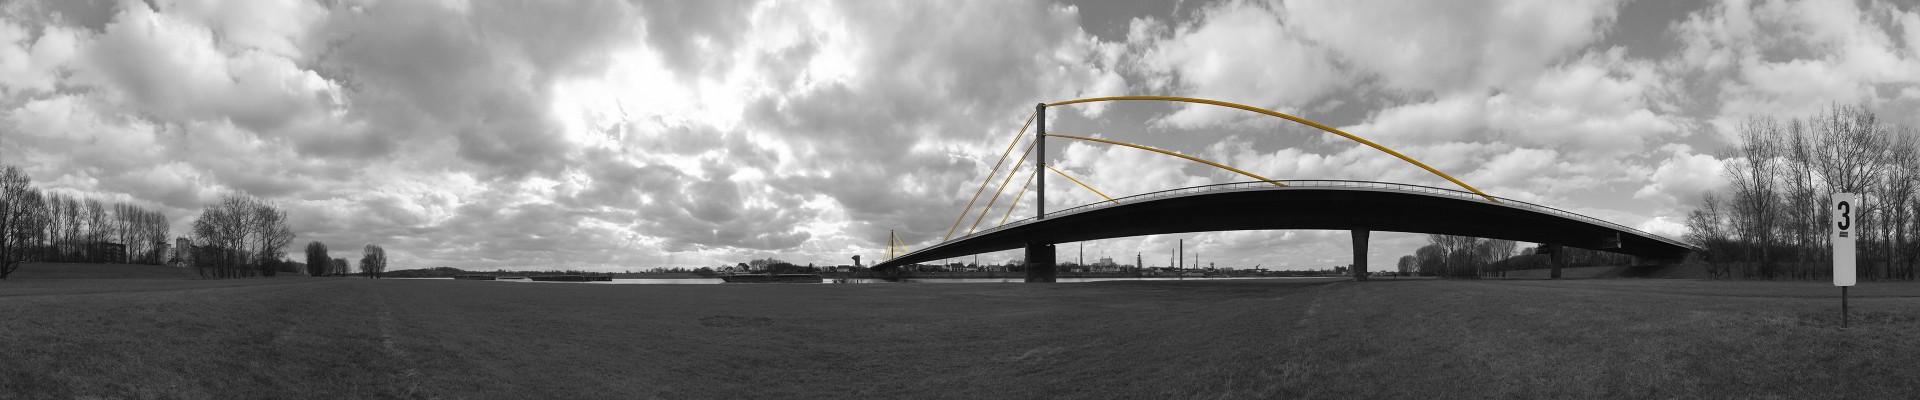 Panorama am Rhein P10b sw/gelb • Lambda-Print auf FUJIFILM Crystal Archive DPII, Diasec®/Acryl, 120 x 25 cm • Auflage: 5 + 2 Artist's Proof